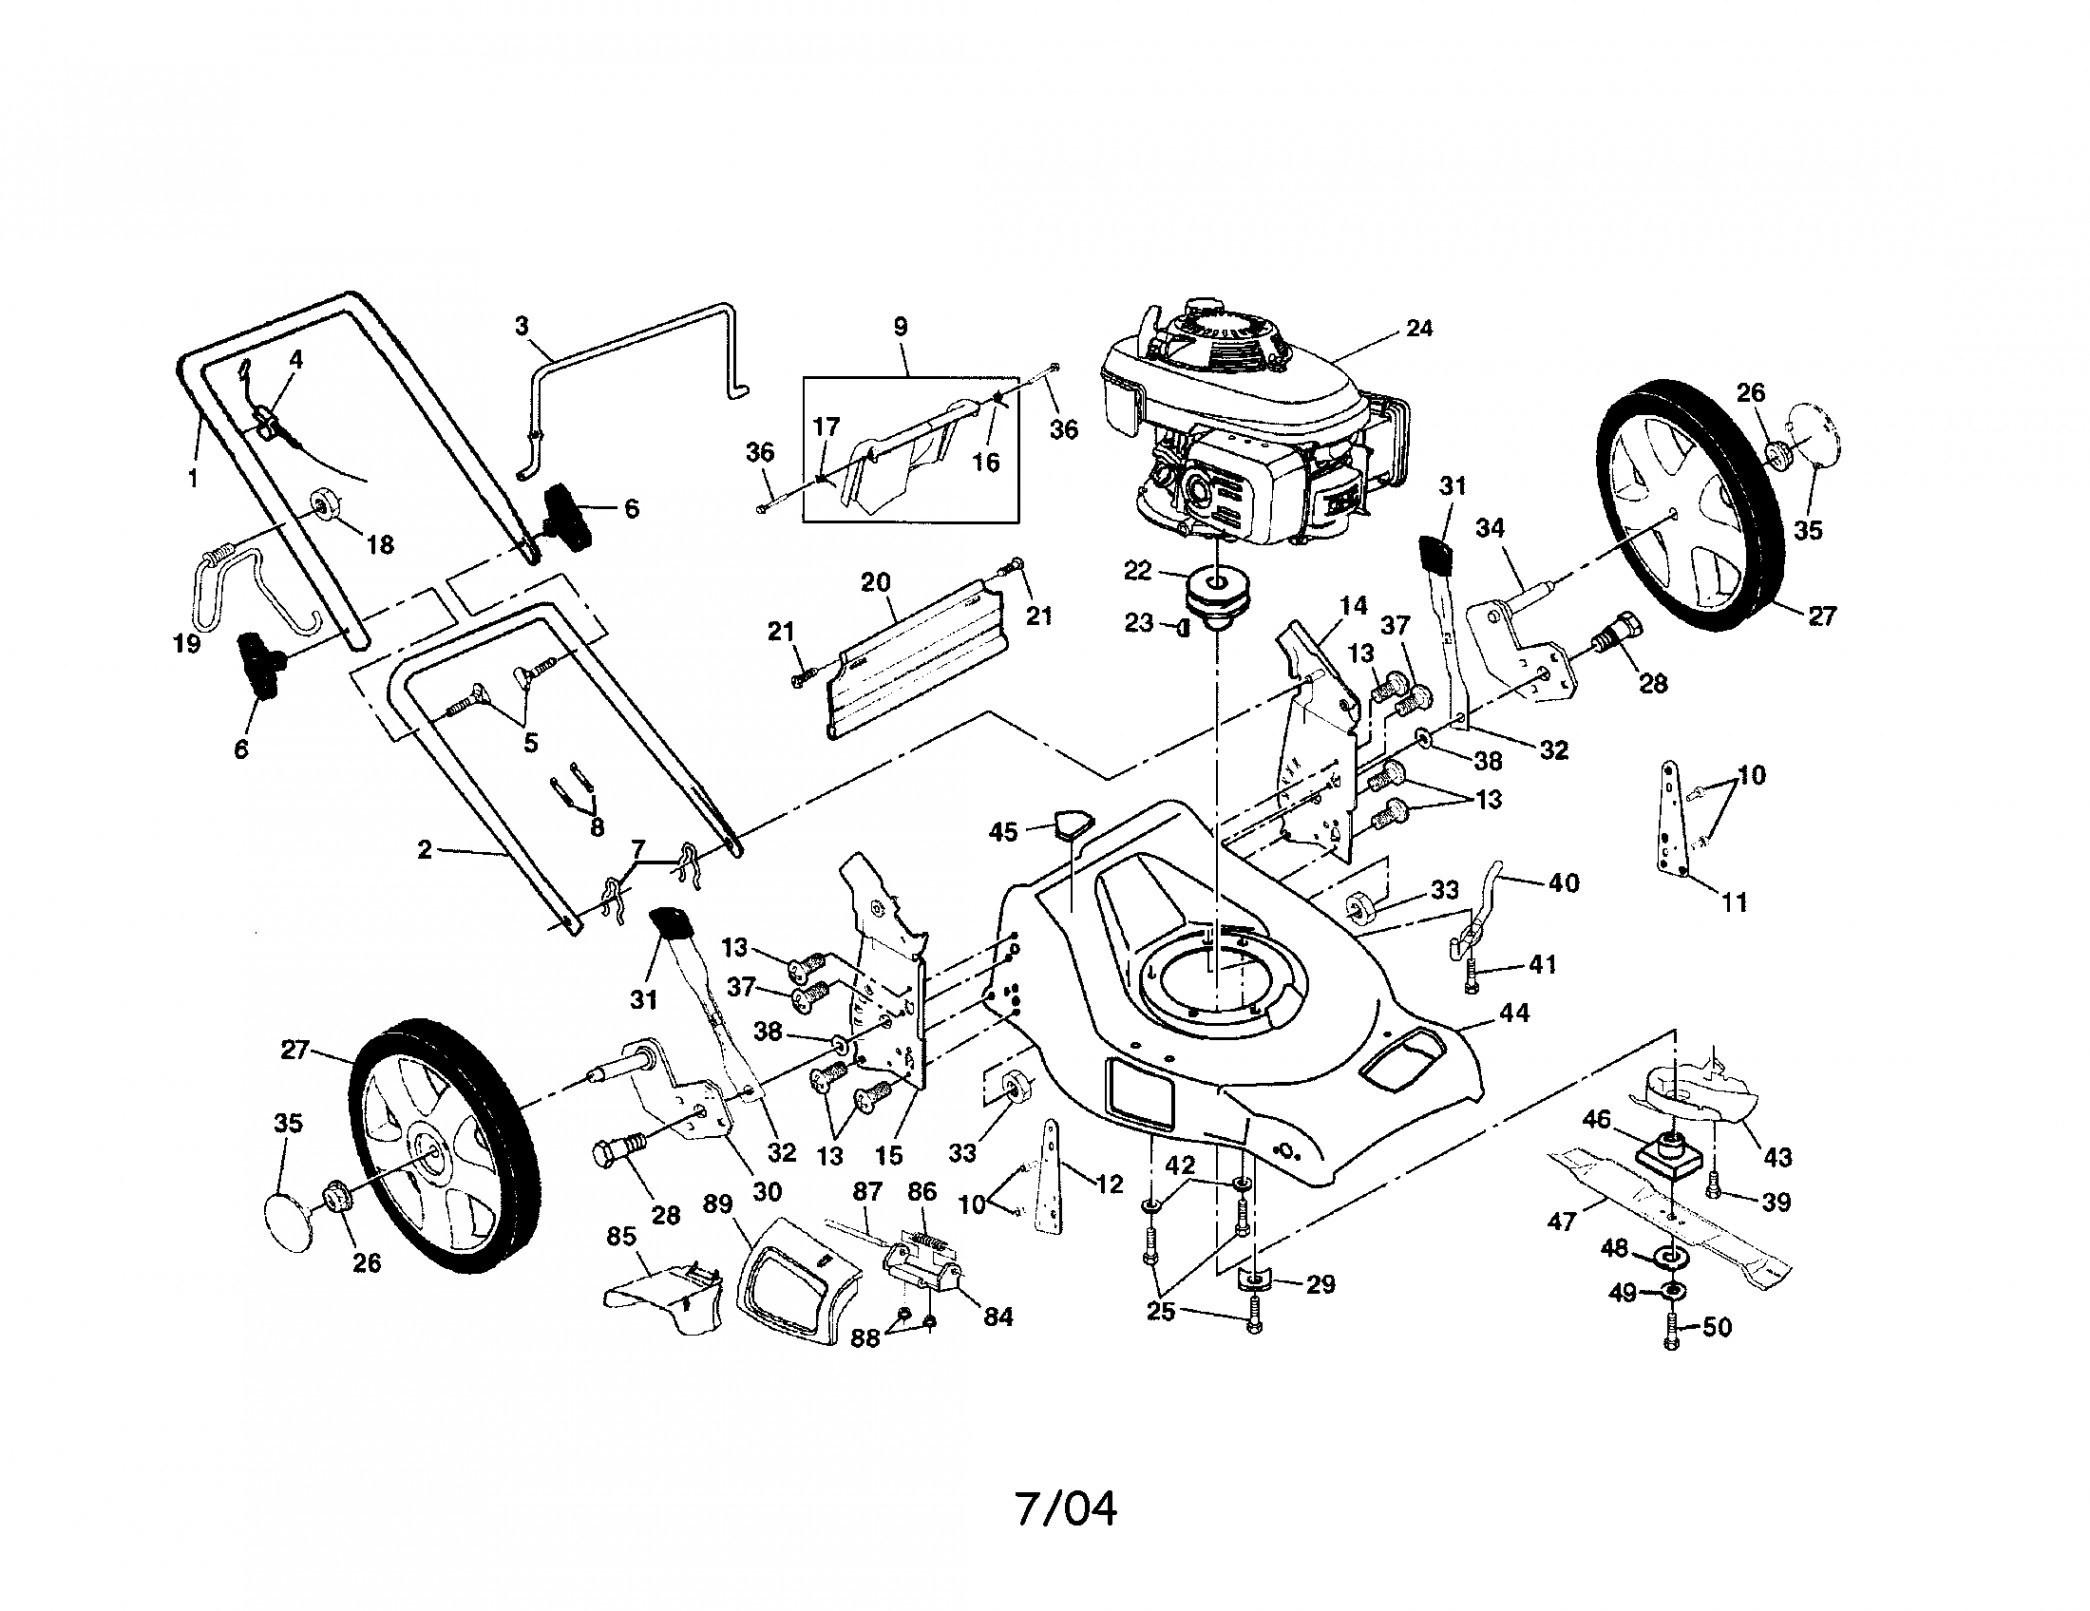 Honda Hrx217 Parts Diagram Considerable Honda Lawn Mower Parts Diagram Honda Mower Blades Of Honda Hrx217 Parts Diagram